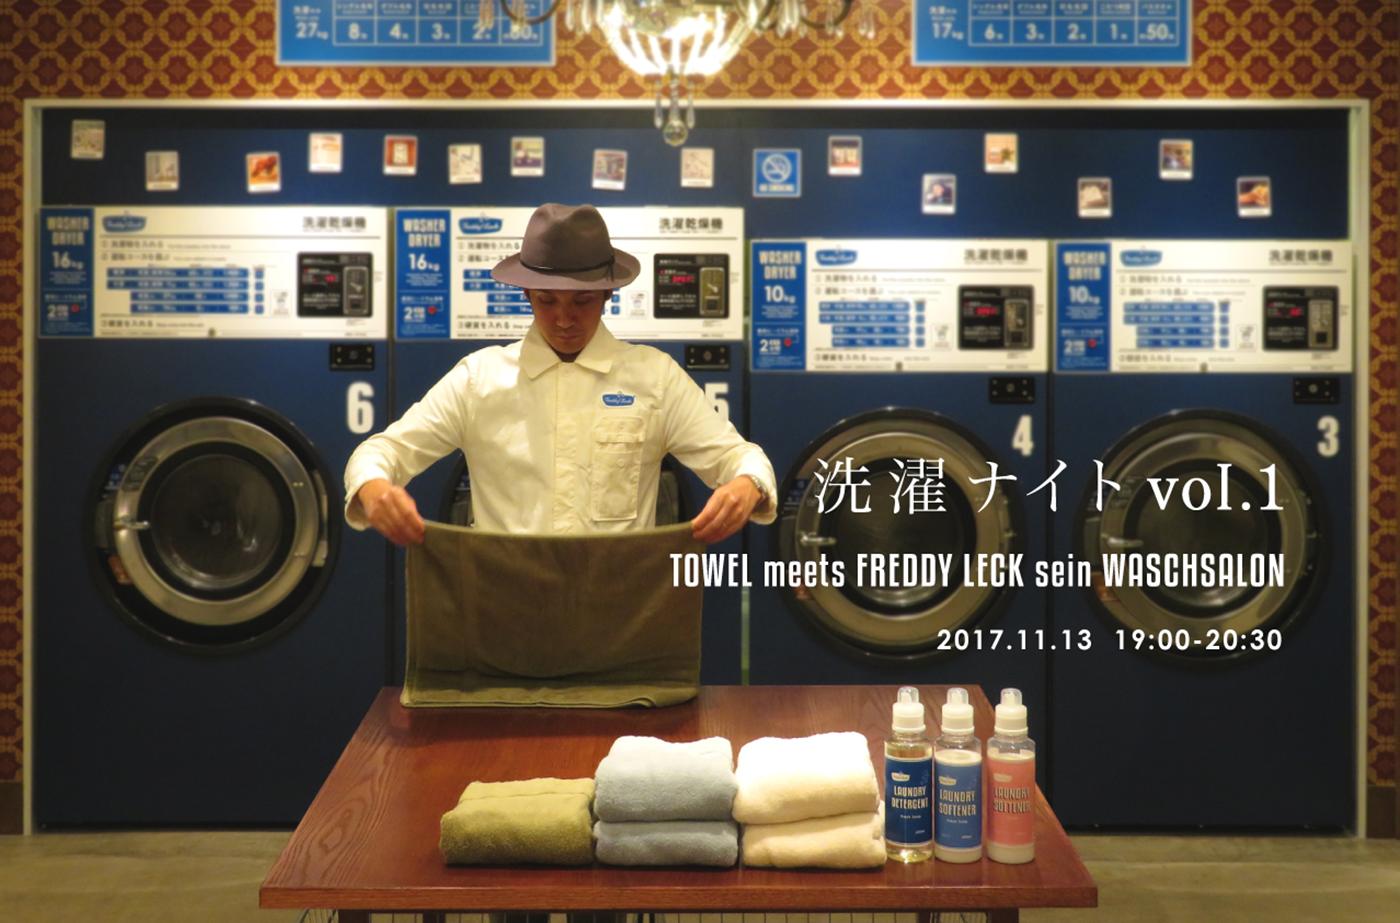 Freddy Leck Sein Waschsalon くらしの丁度品店 洗濯ナイト vol 1 towel meets freddy leck sein